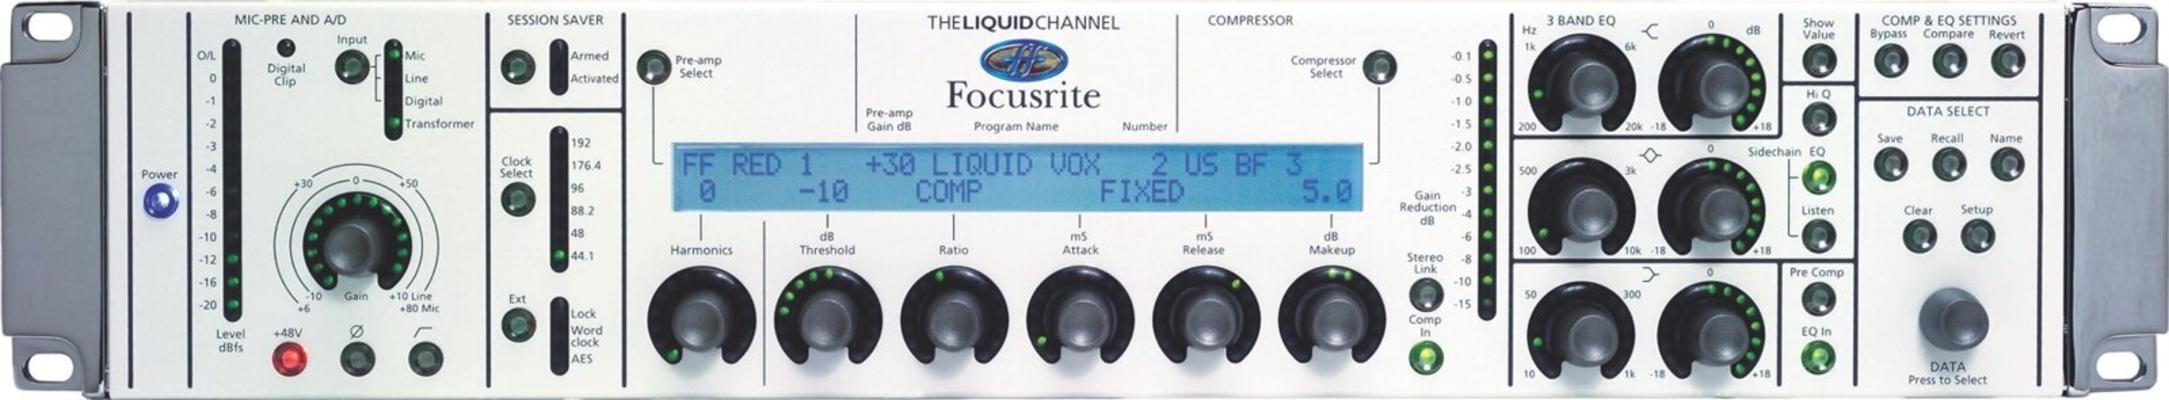 Focusrite The Liquid Channel